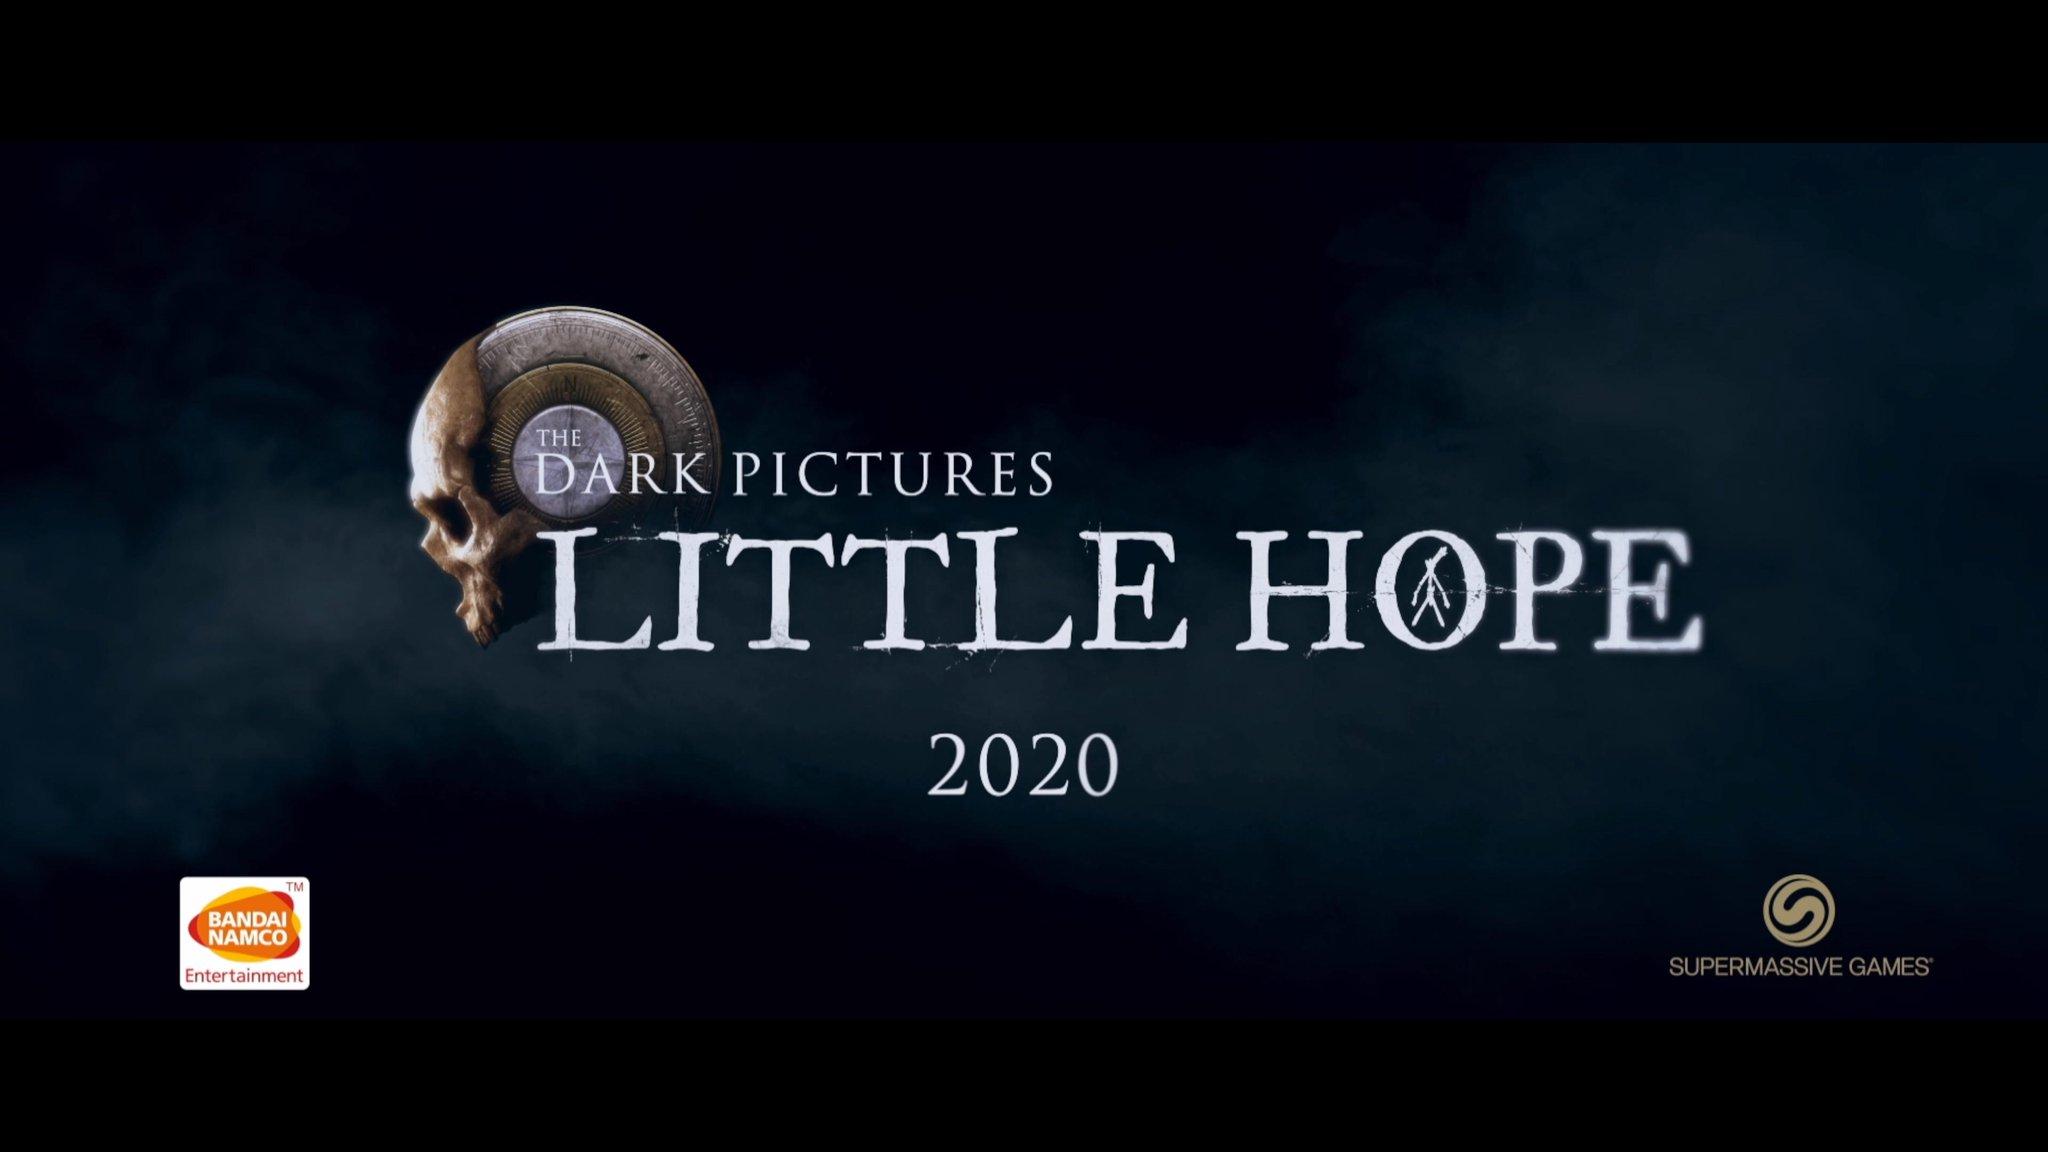 Prochain match dans Dark Pictures anthologie Little Hope taquine